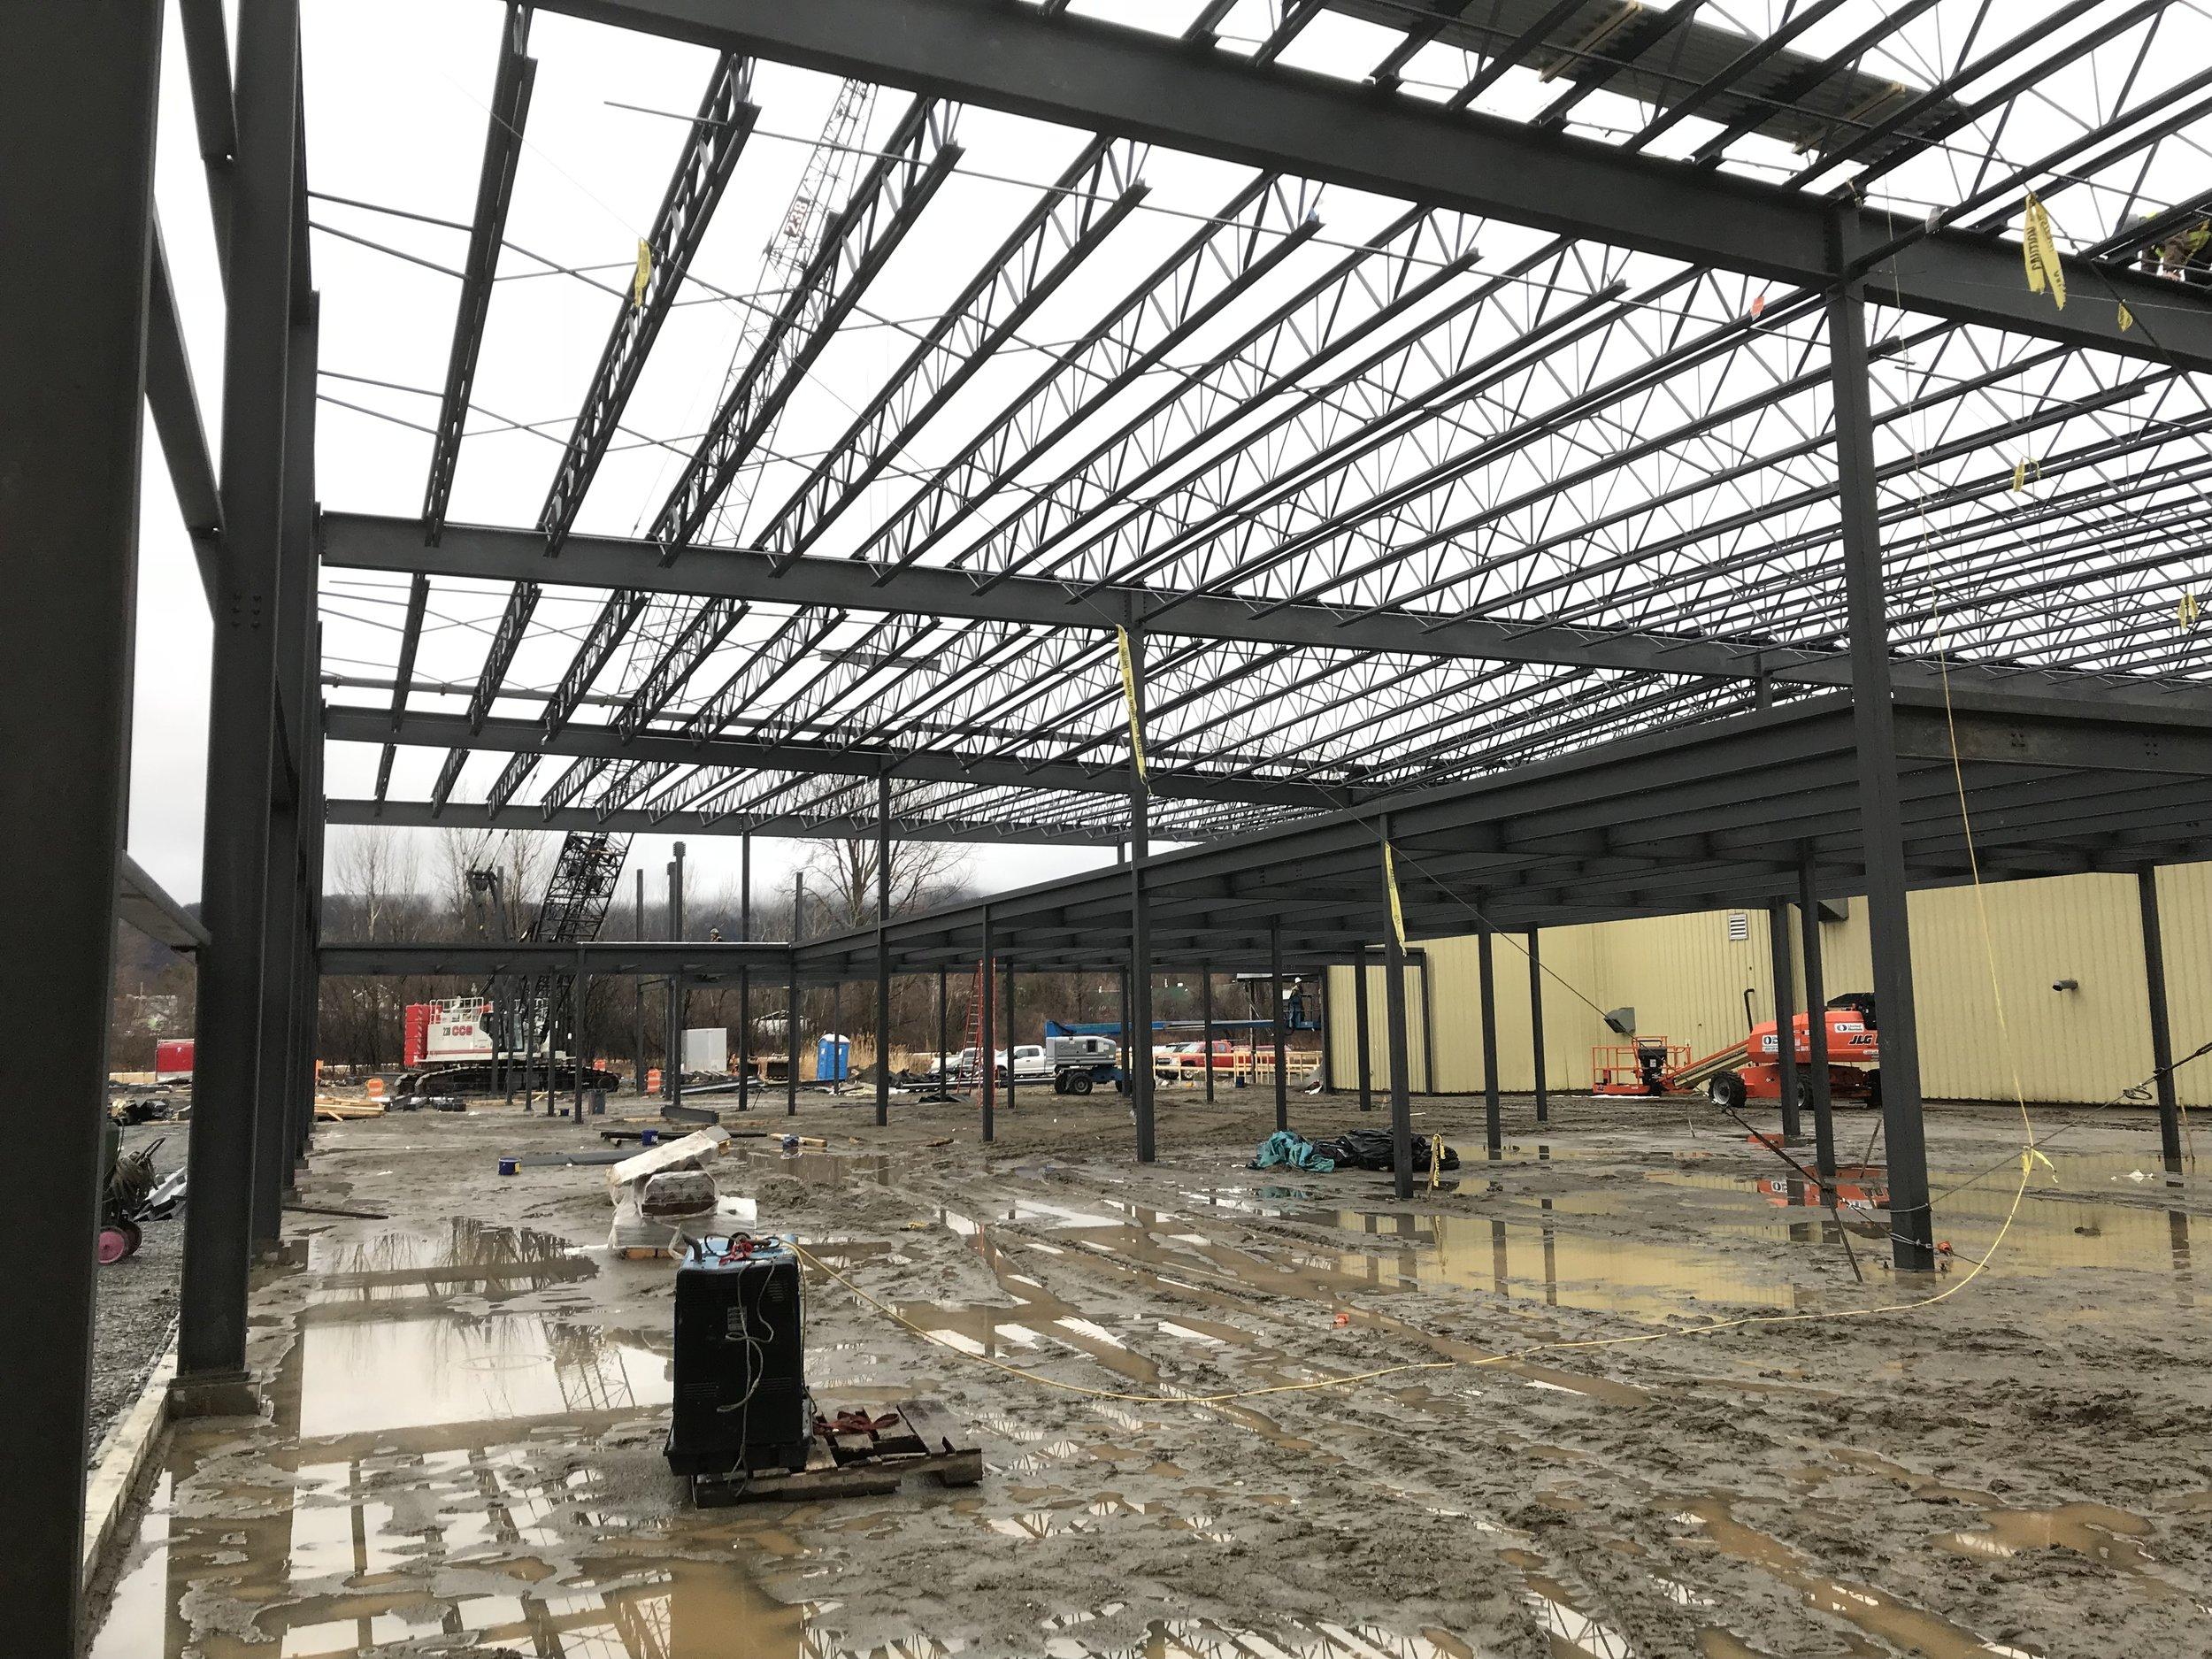 Barry Callebaut Under Construction 1.JPG